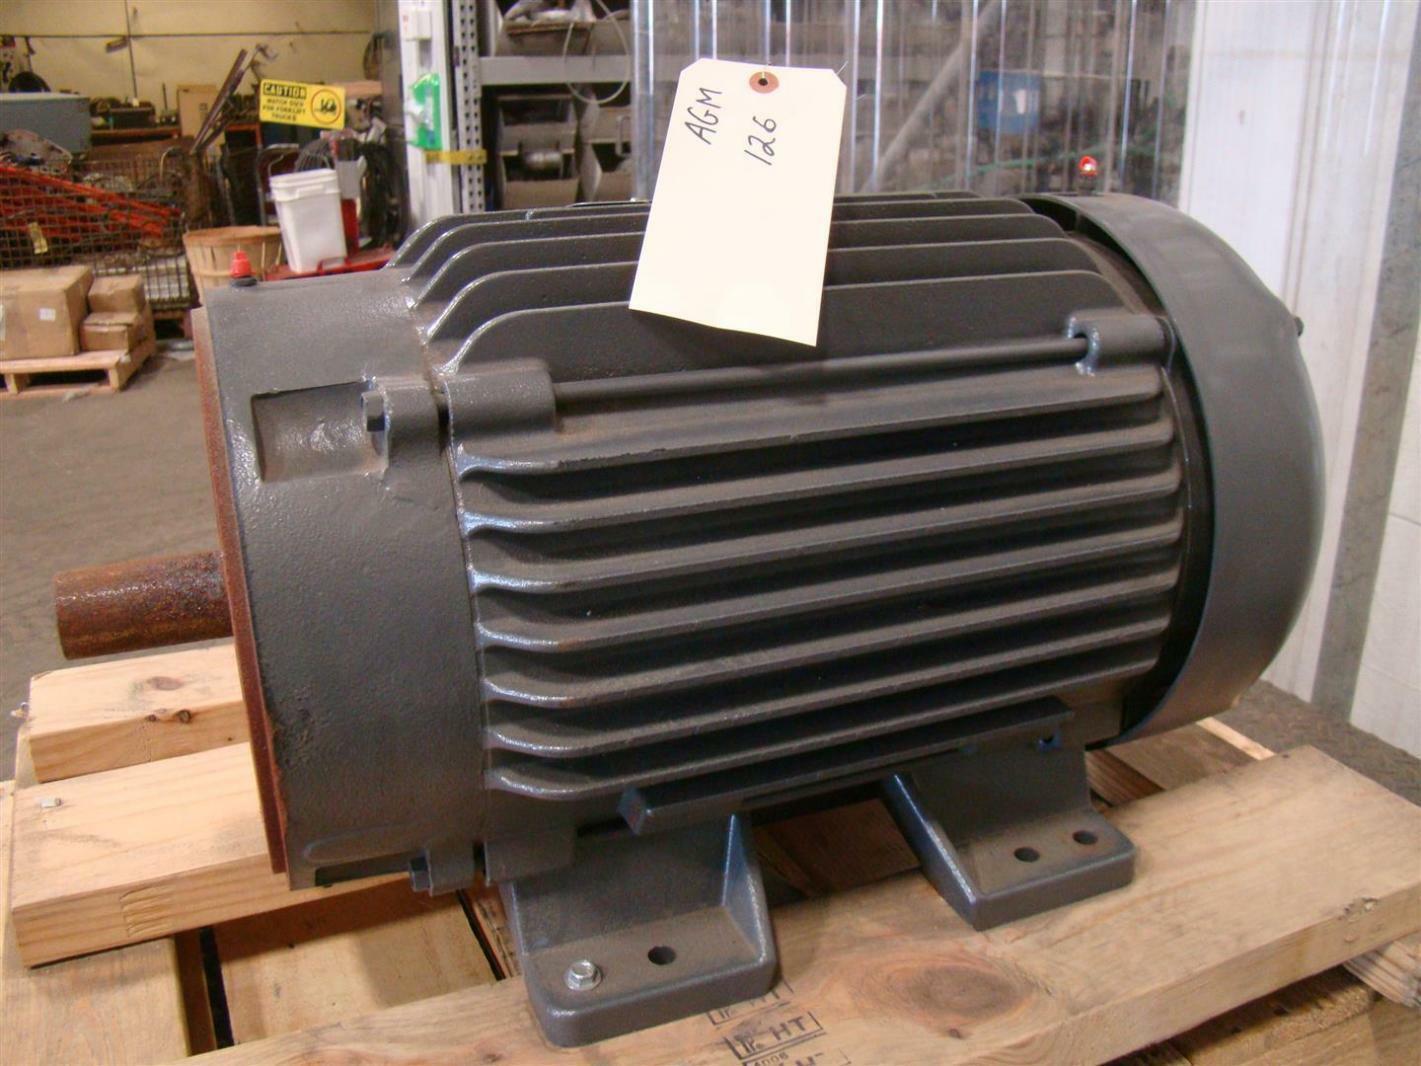 Baldor standard e 15 20hp electric motor 380 460v 42 for Motor baldor 20 hp